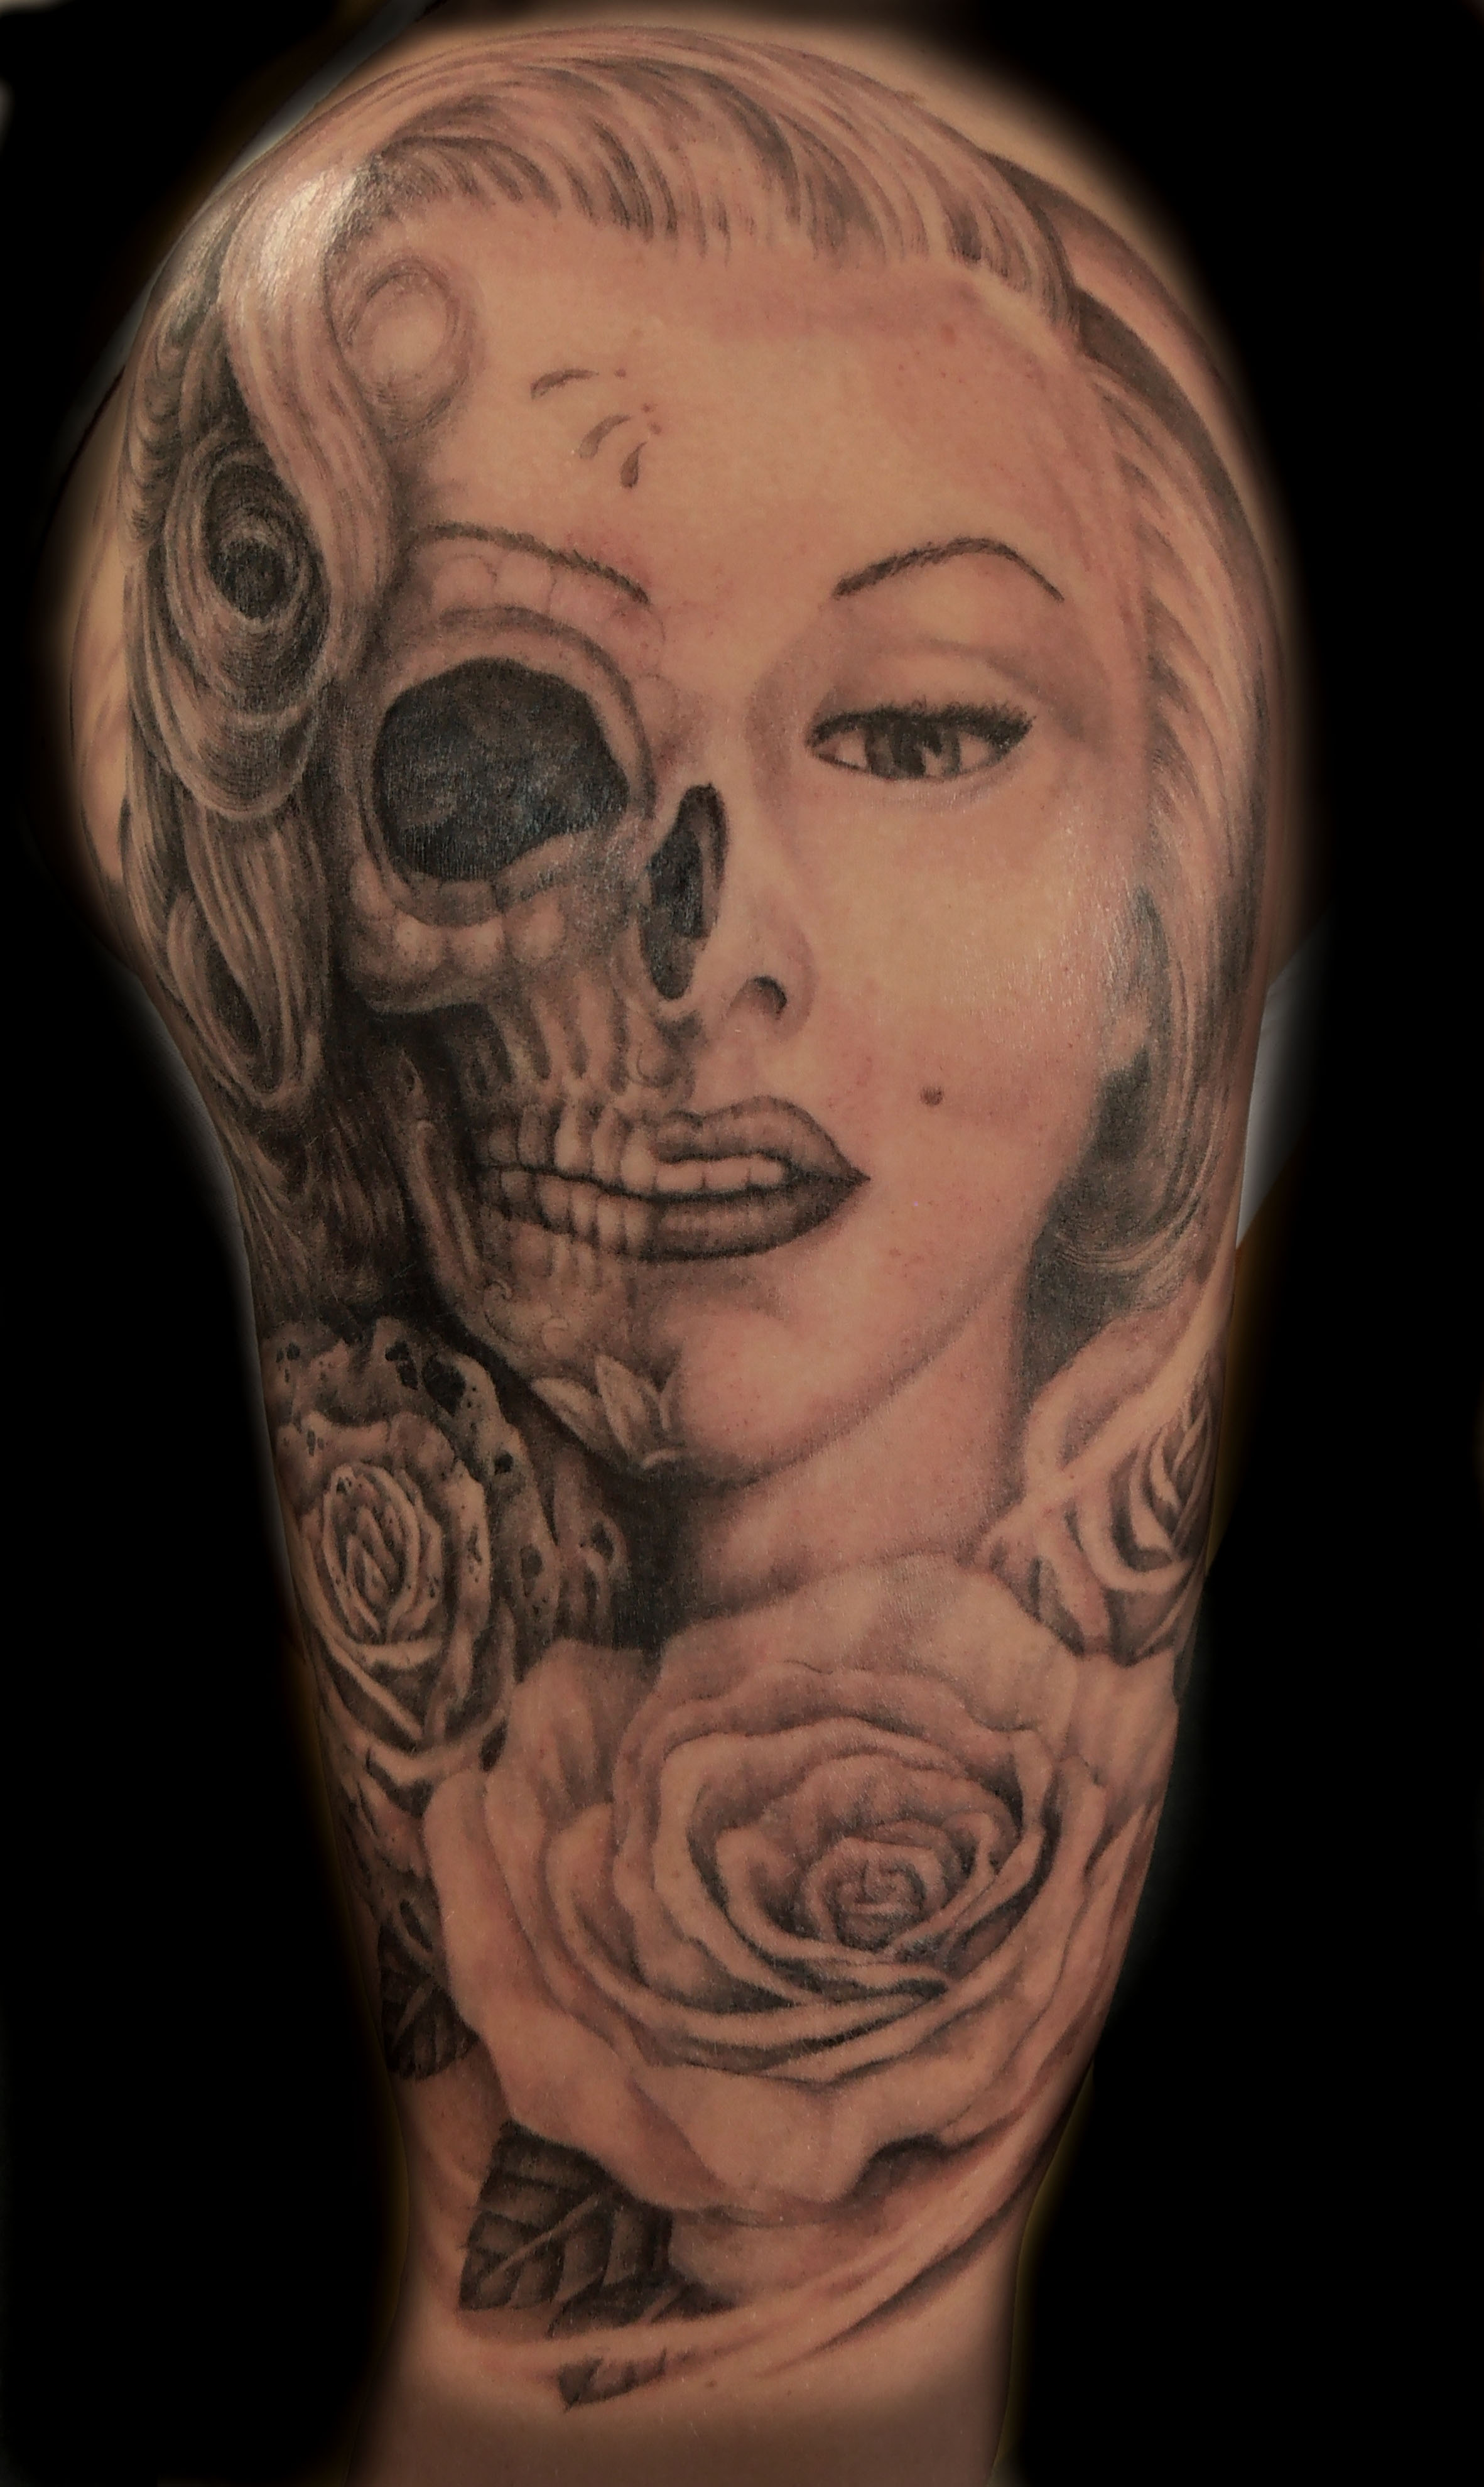 45+] Tattooed Marilyn Monroe Wallpaper on WallpaperSafari